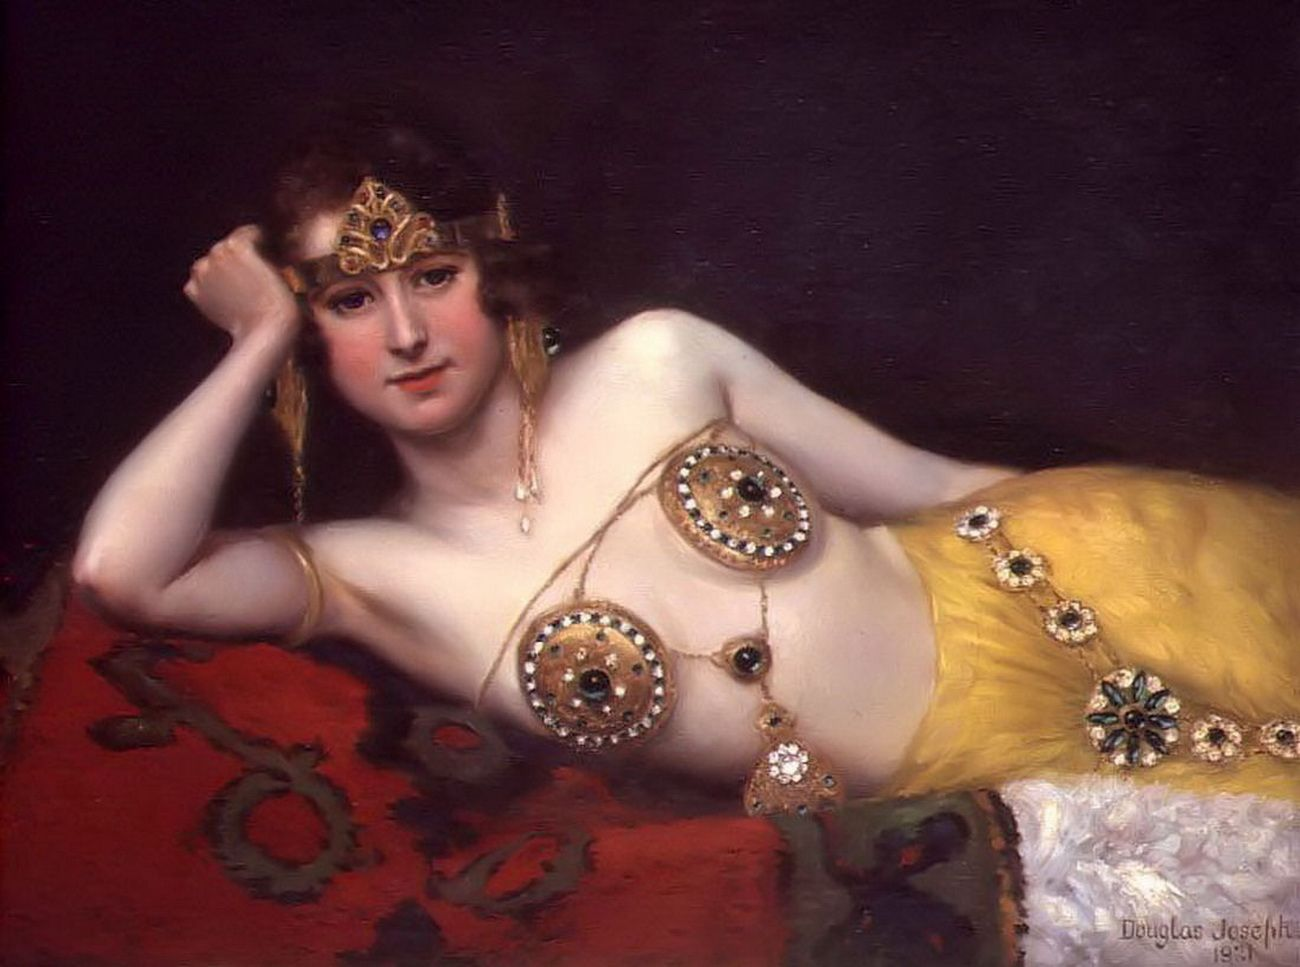 Arousing ars art erotic erotica history